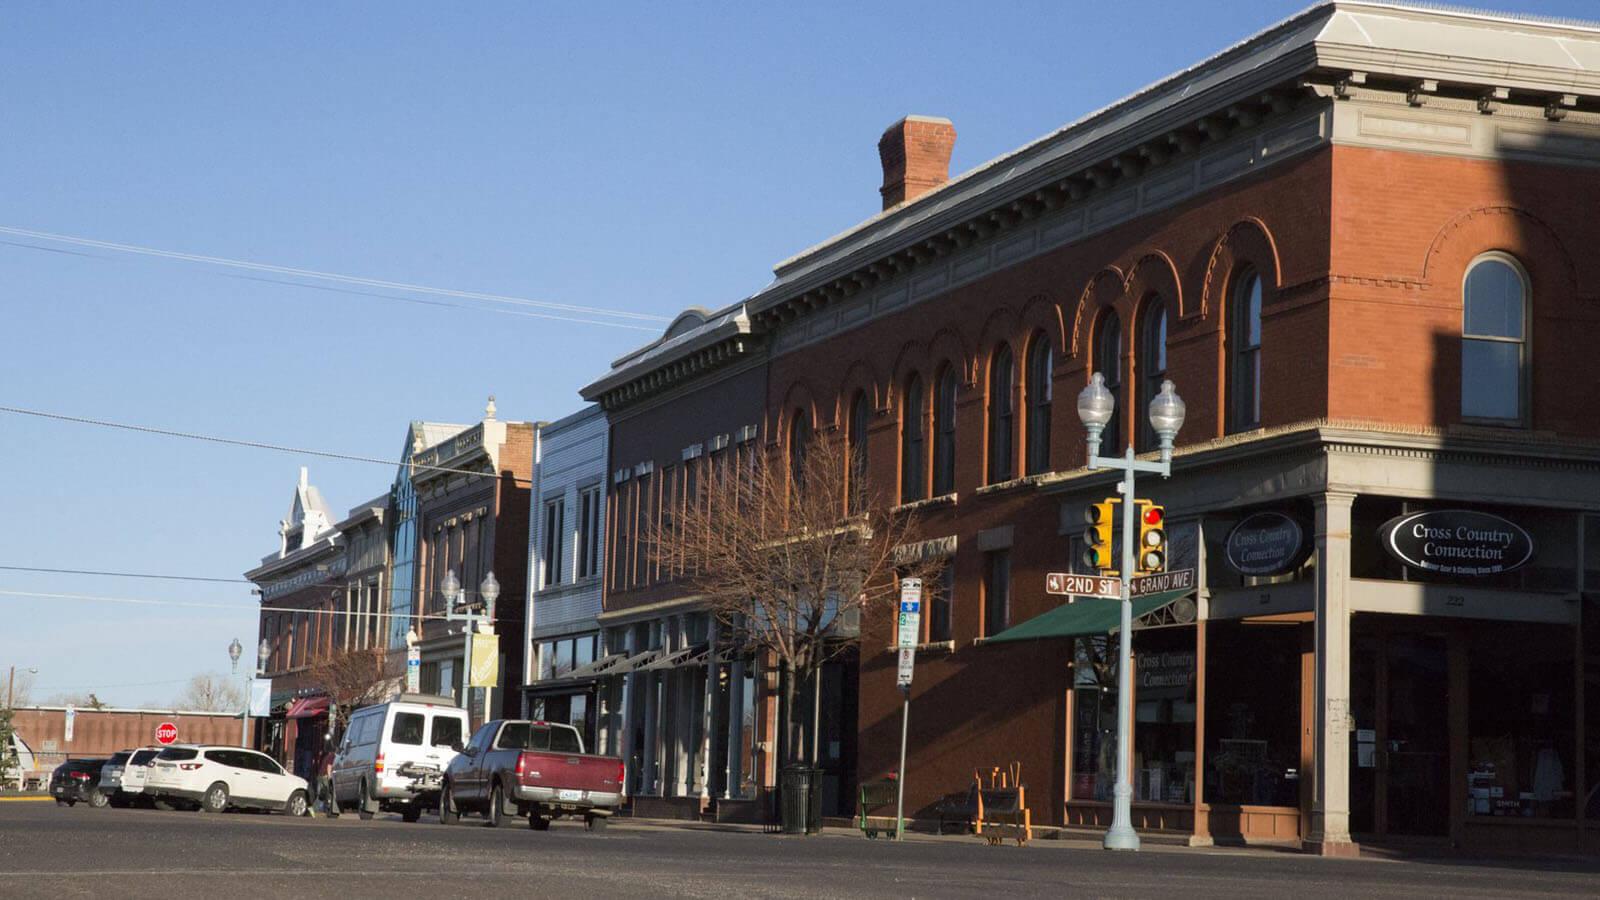 downtown Laramie street